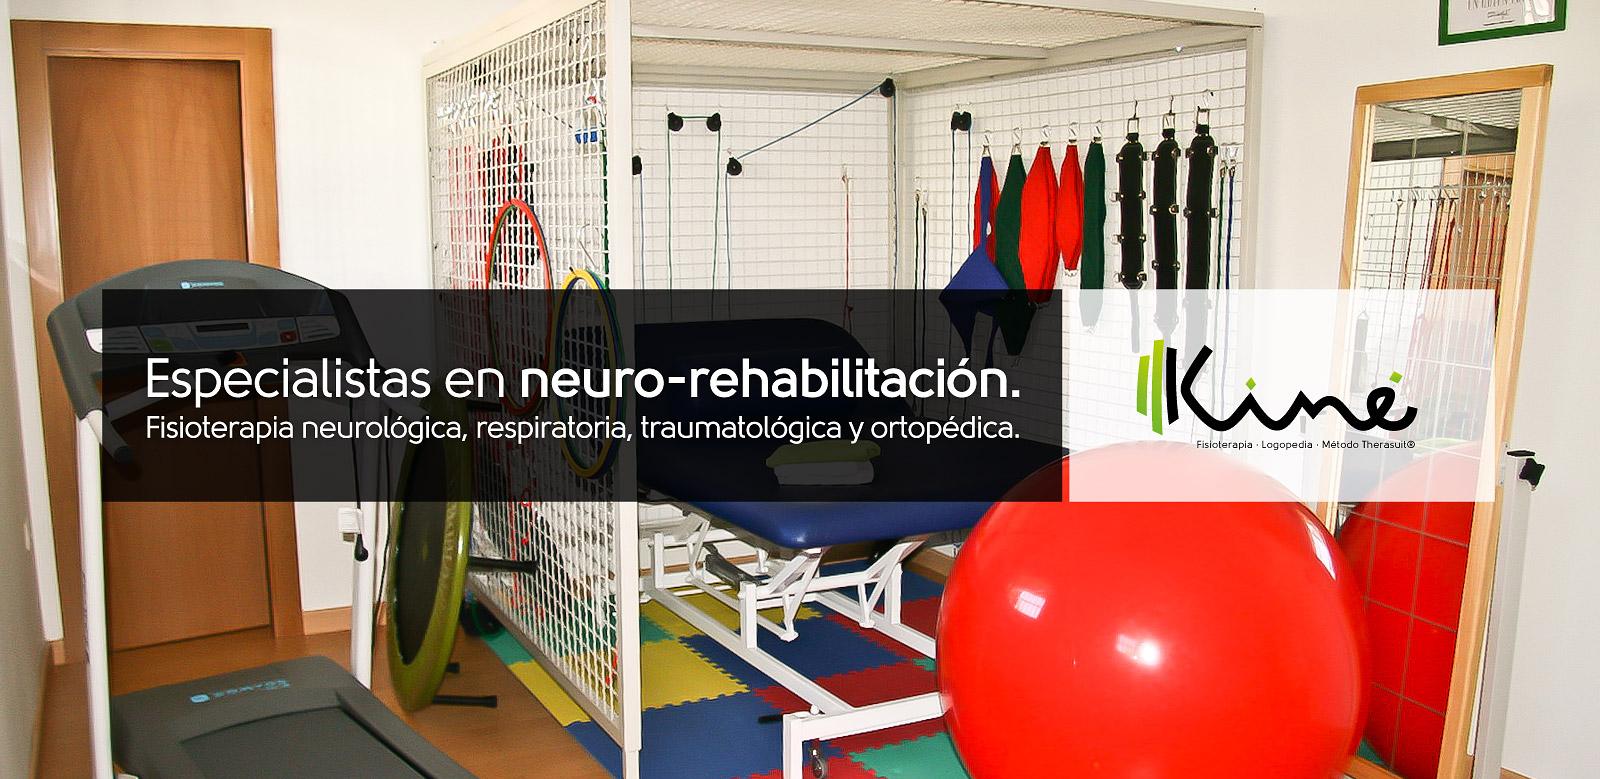 fisioterapia-slider3-kine-rehabilitacion